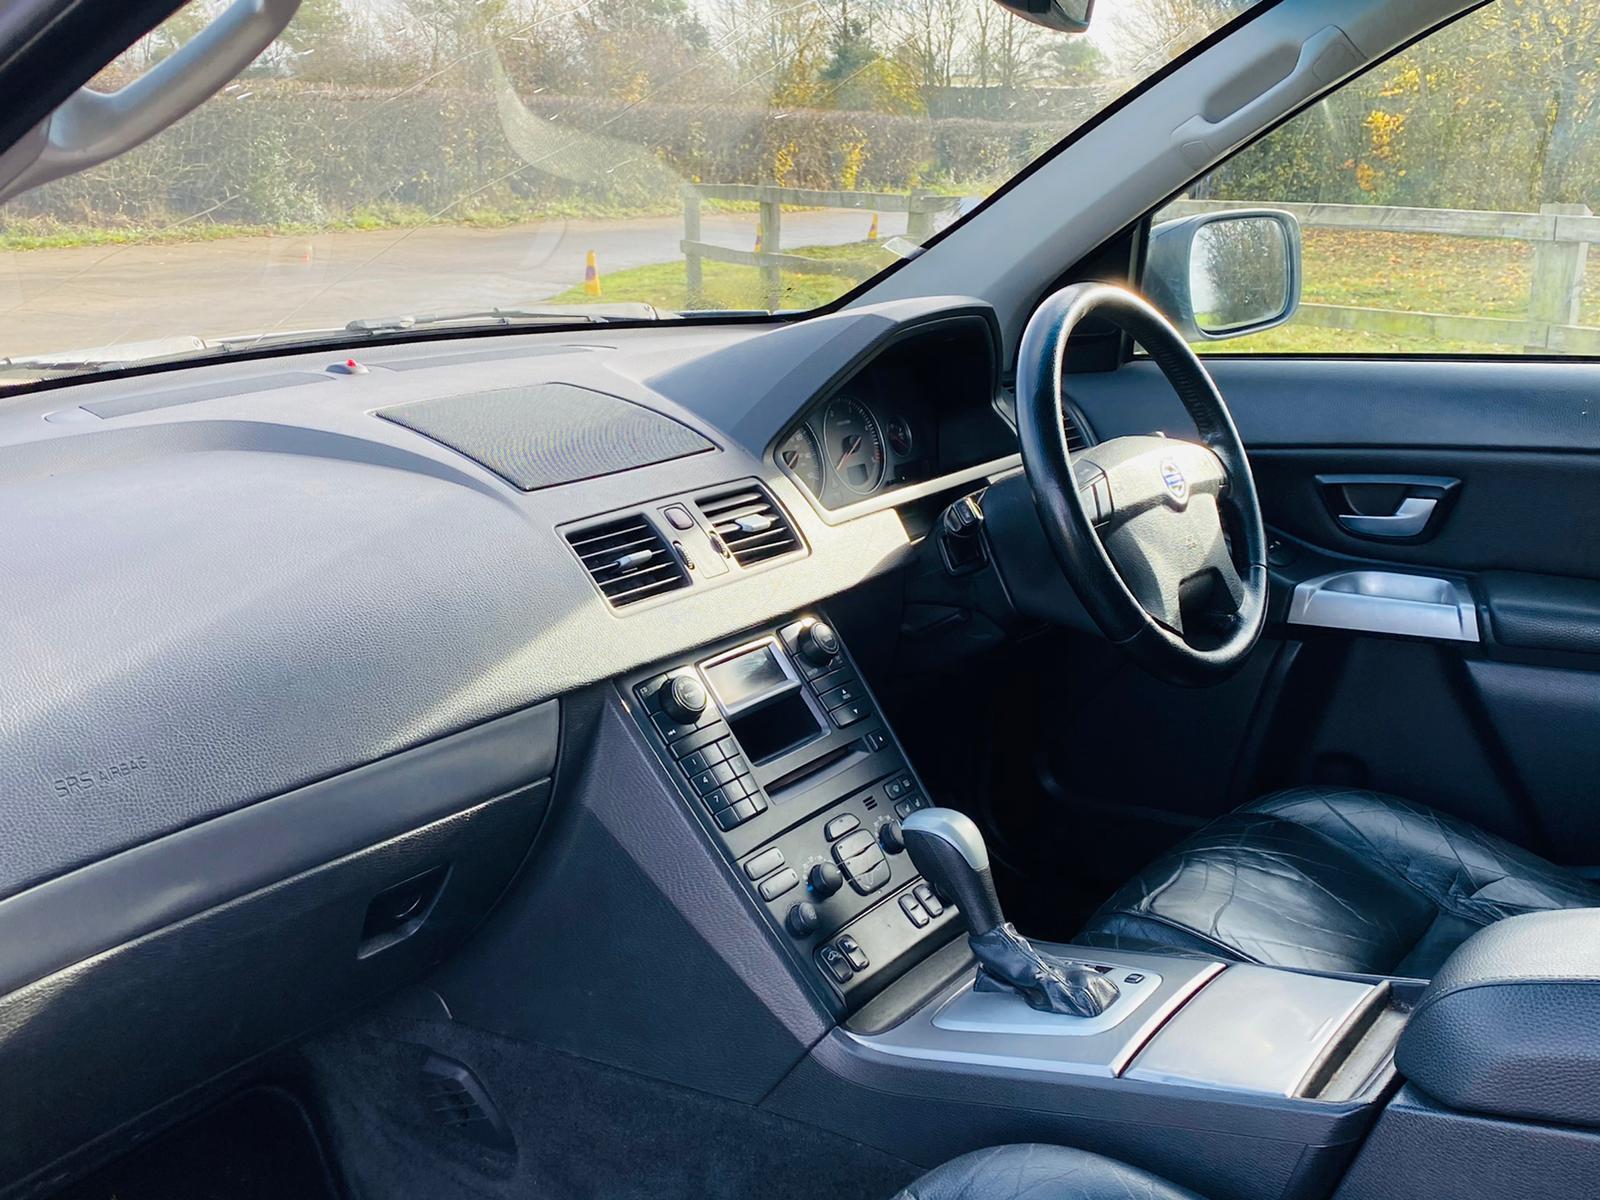 Volvo XC90 2.4 D5 185bhp SE Geartronic Auto 2006 06 Reg - 7 Seats - Air con - Top Spec - Image 36 of 47